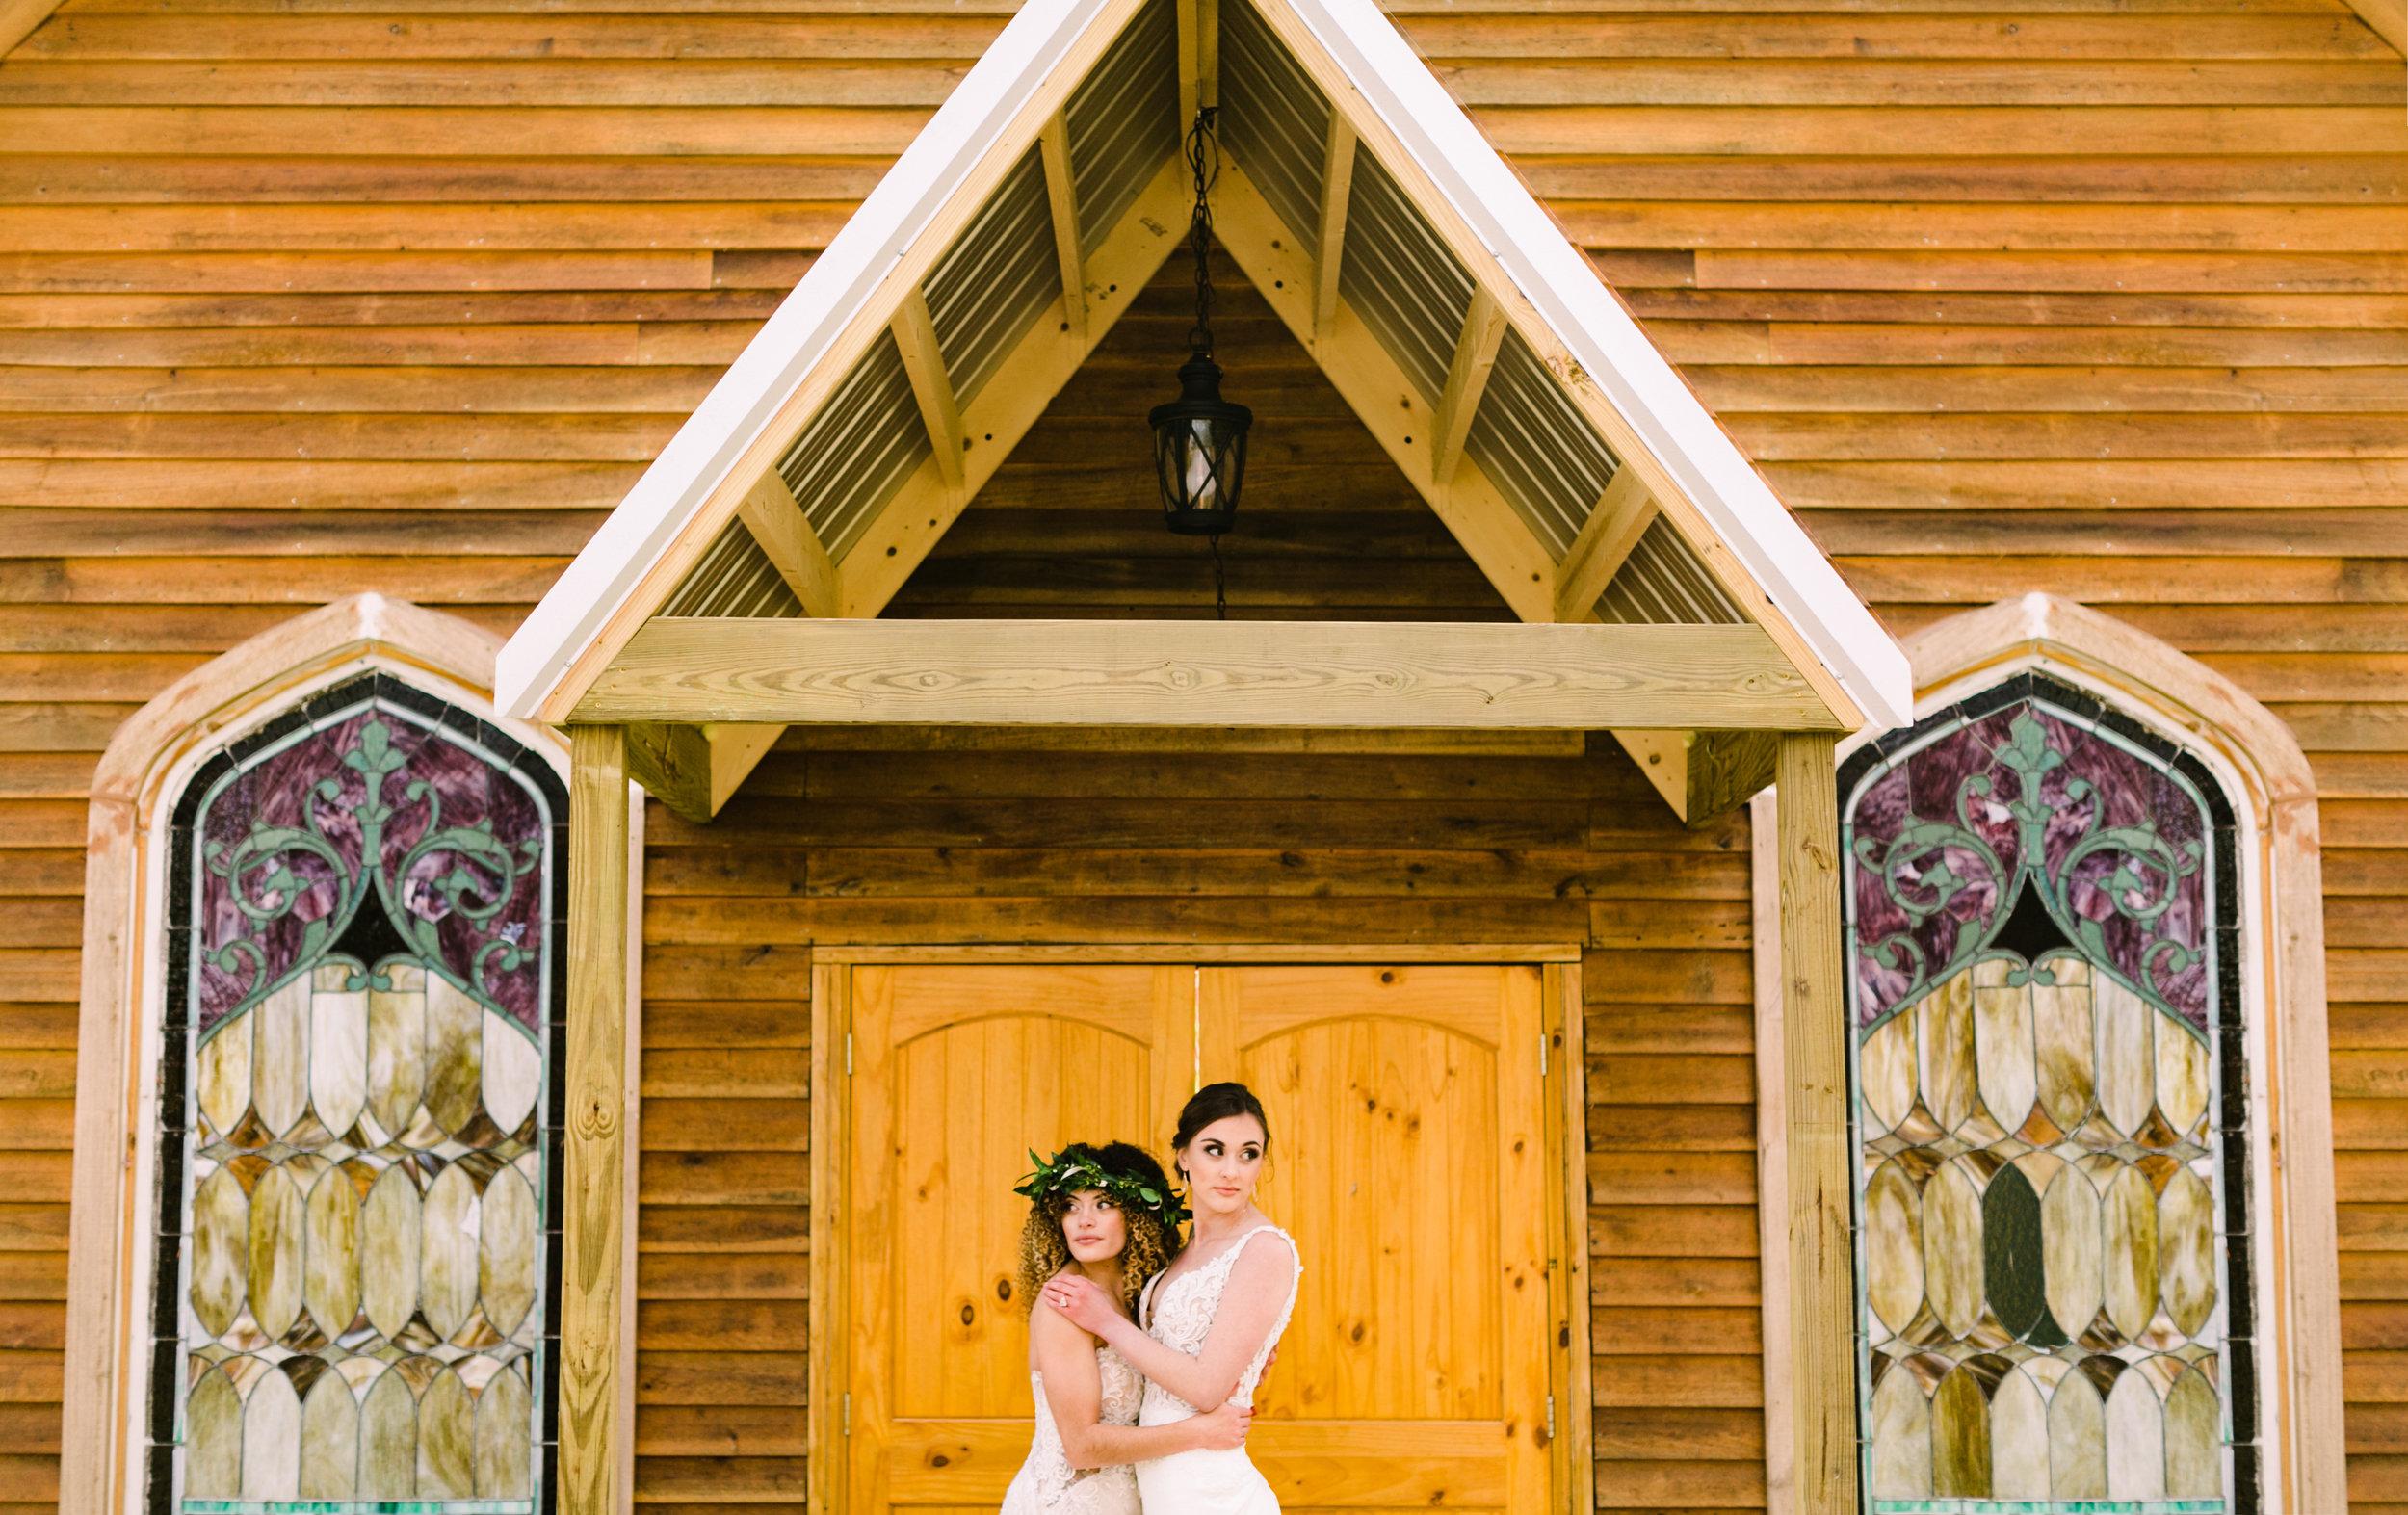 romantic+valentines+day+wedding+horses+chapel (5 of 11).jpg